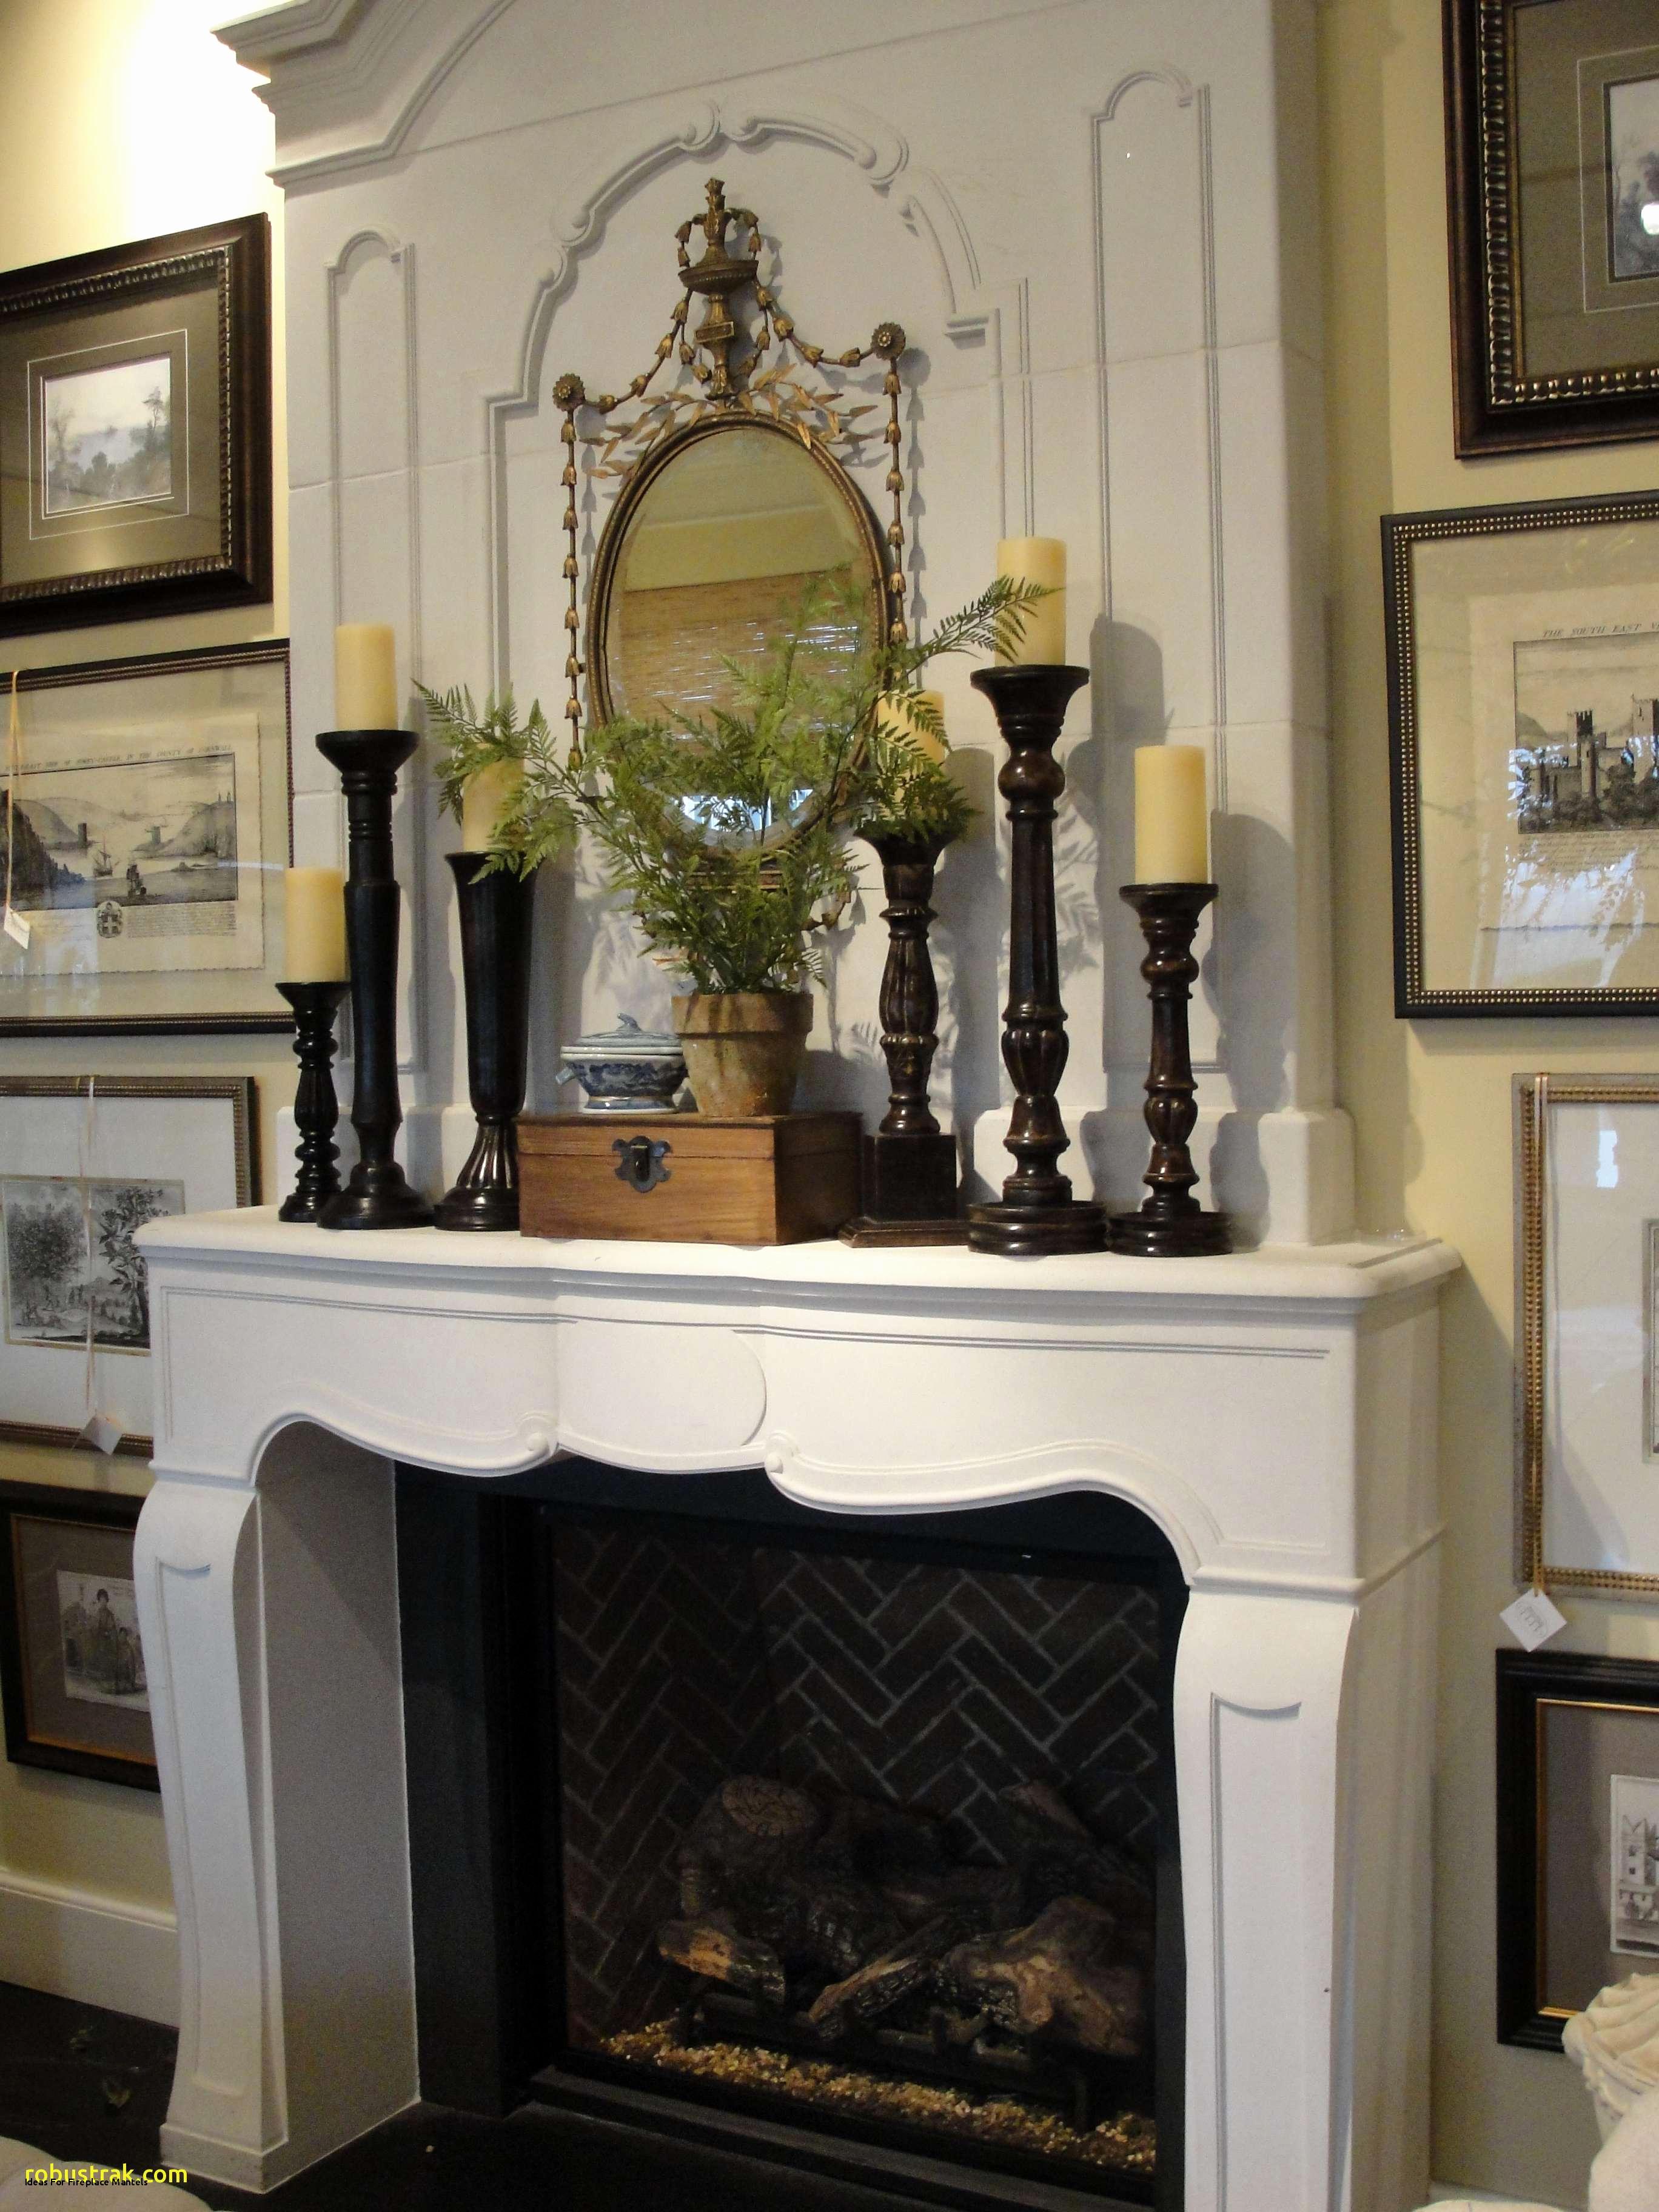 fireplace mantel decor elegant ideas for mantles albertville custom new ideas for fireplace mantels of ideas for fireplace mantels